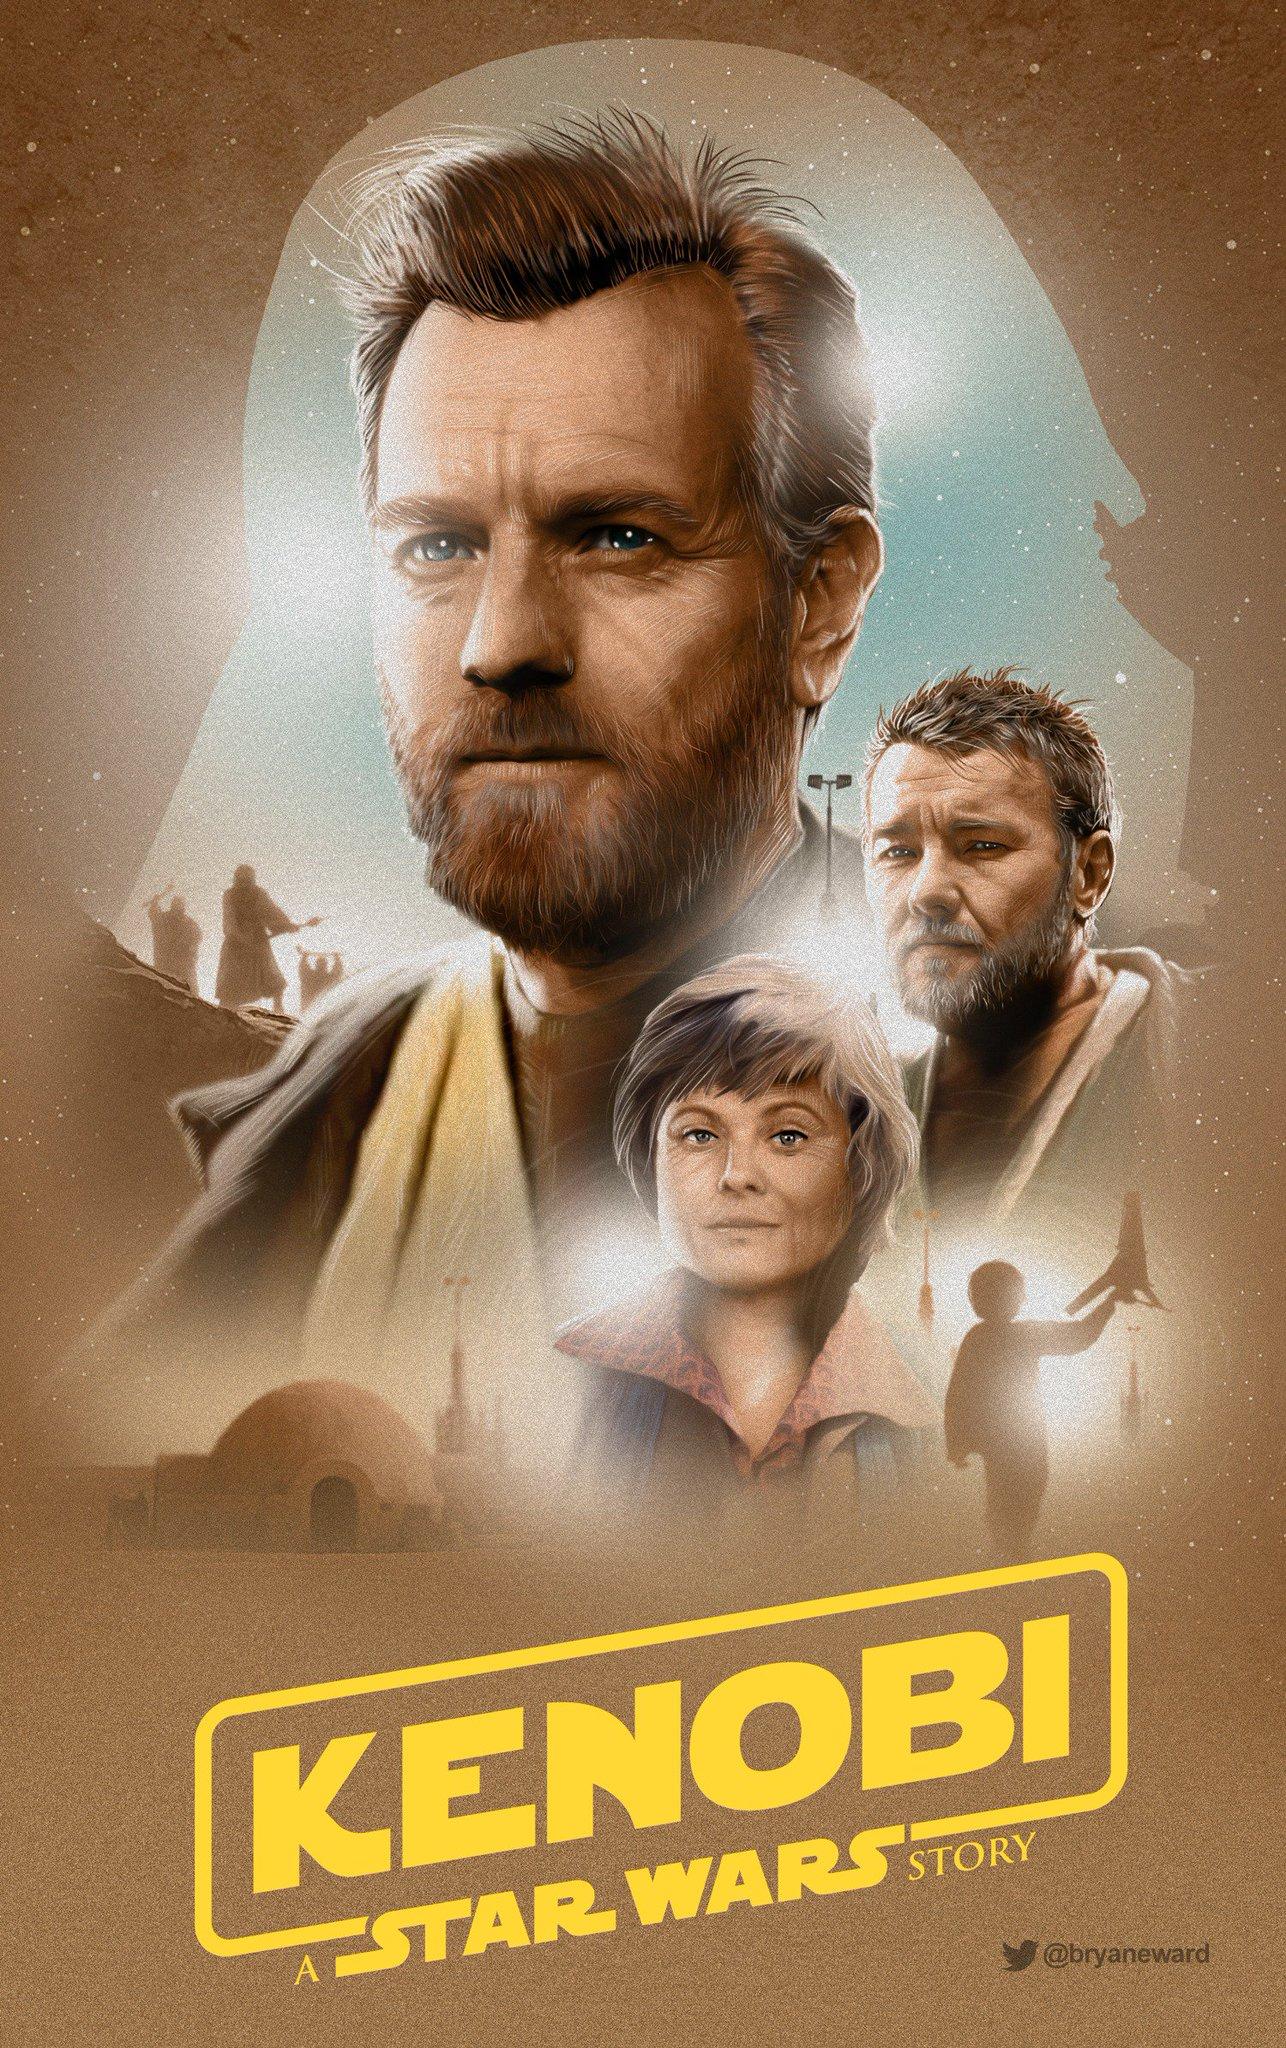 Star wars plot